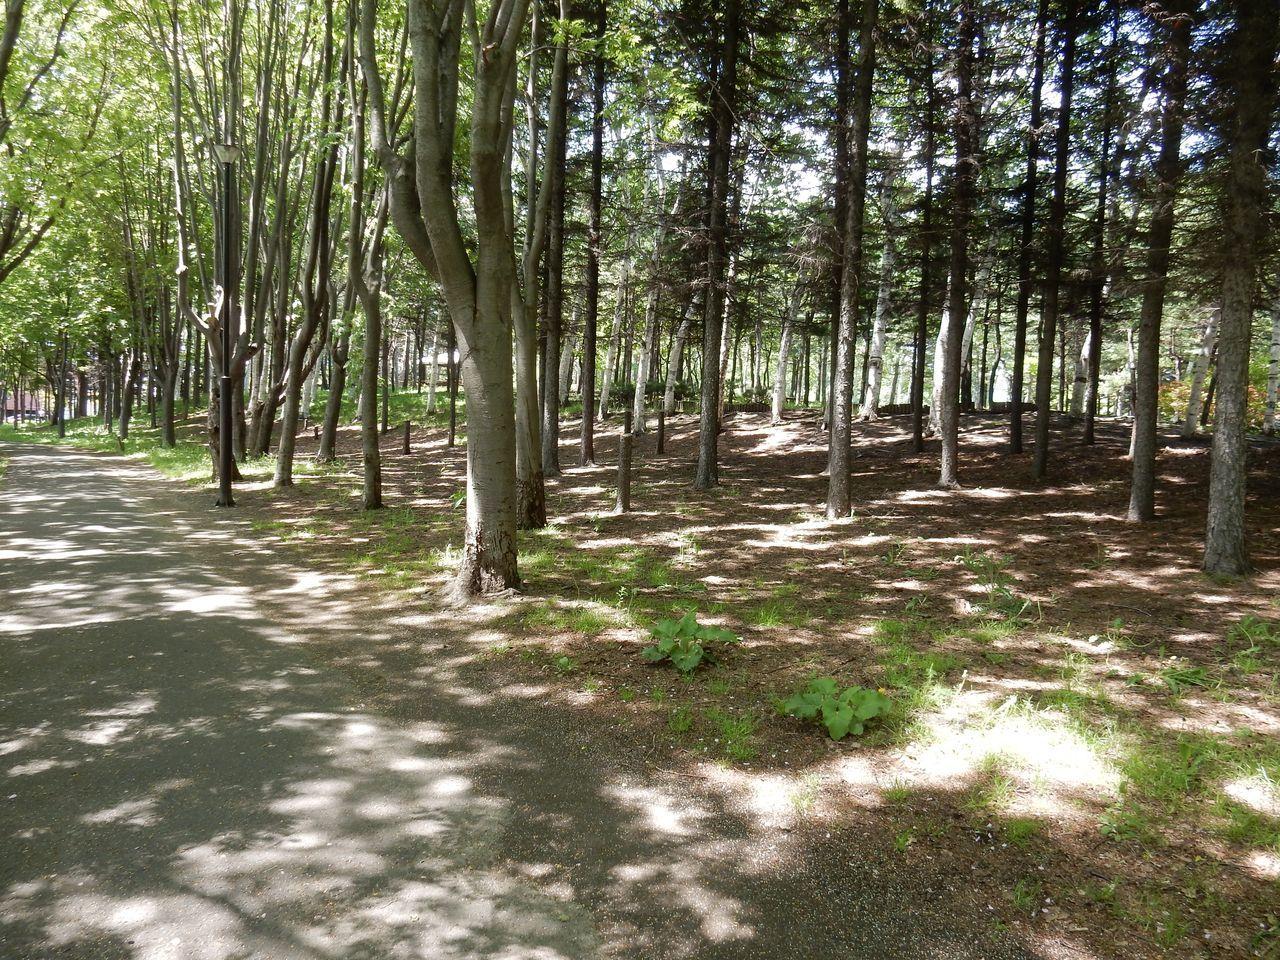 初夏の伏古公園_c0025115_21450771.jpg